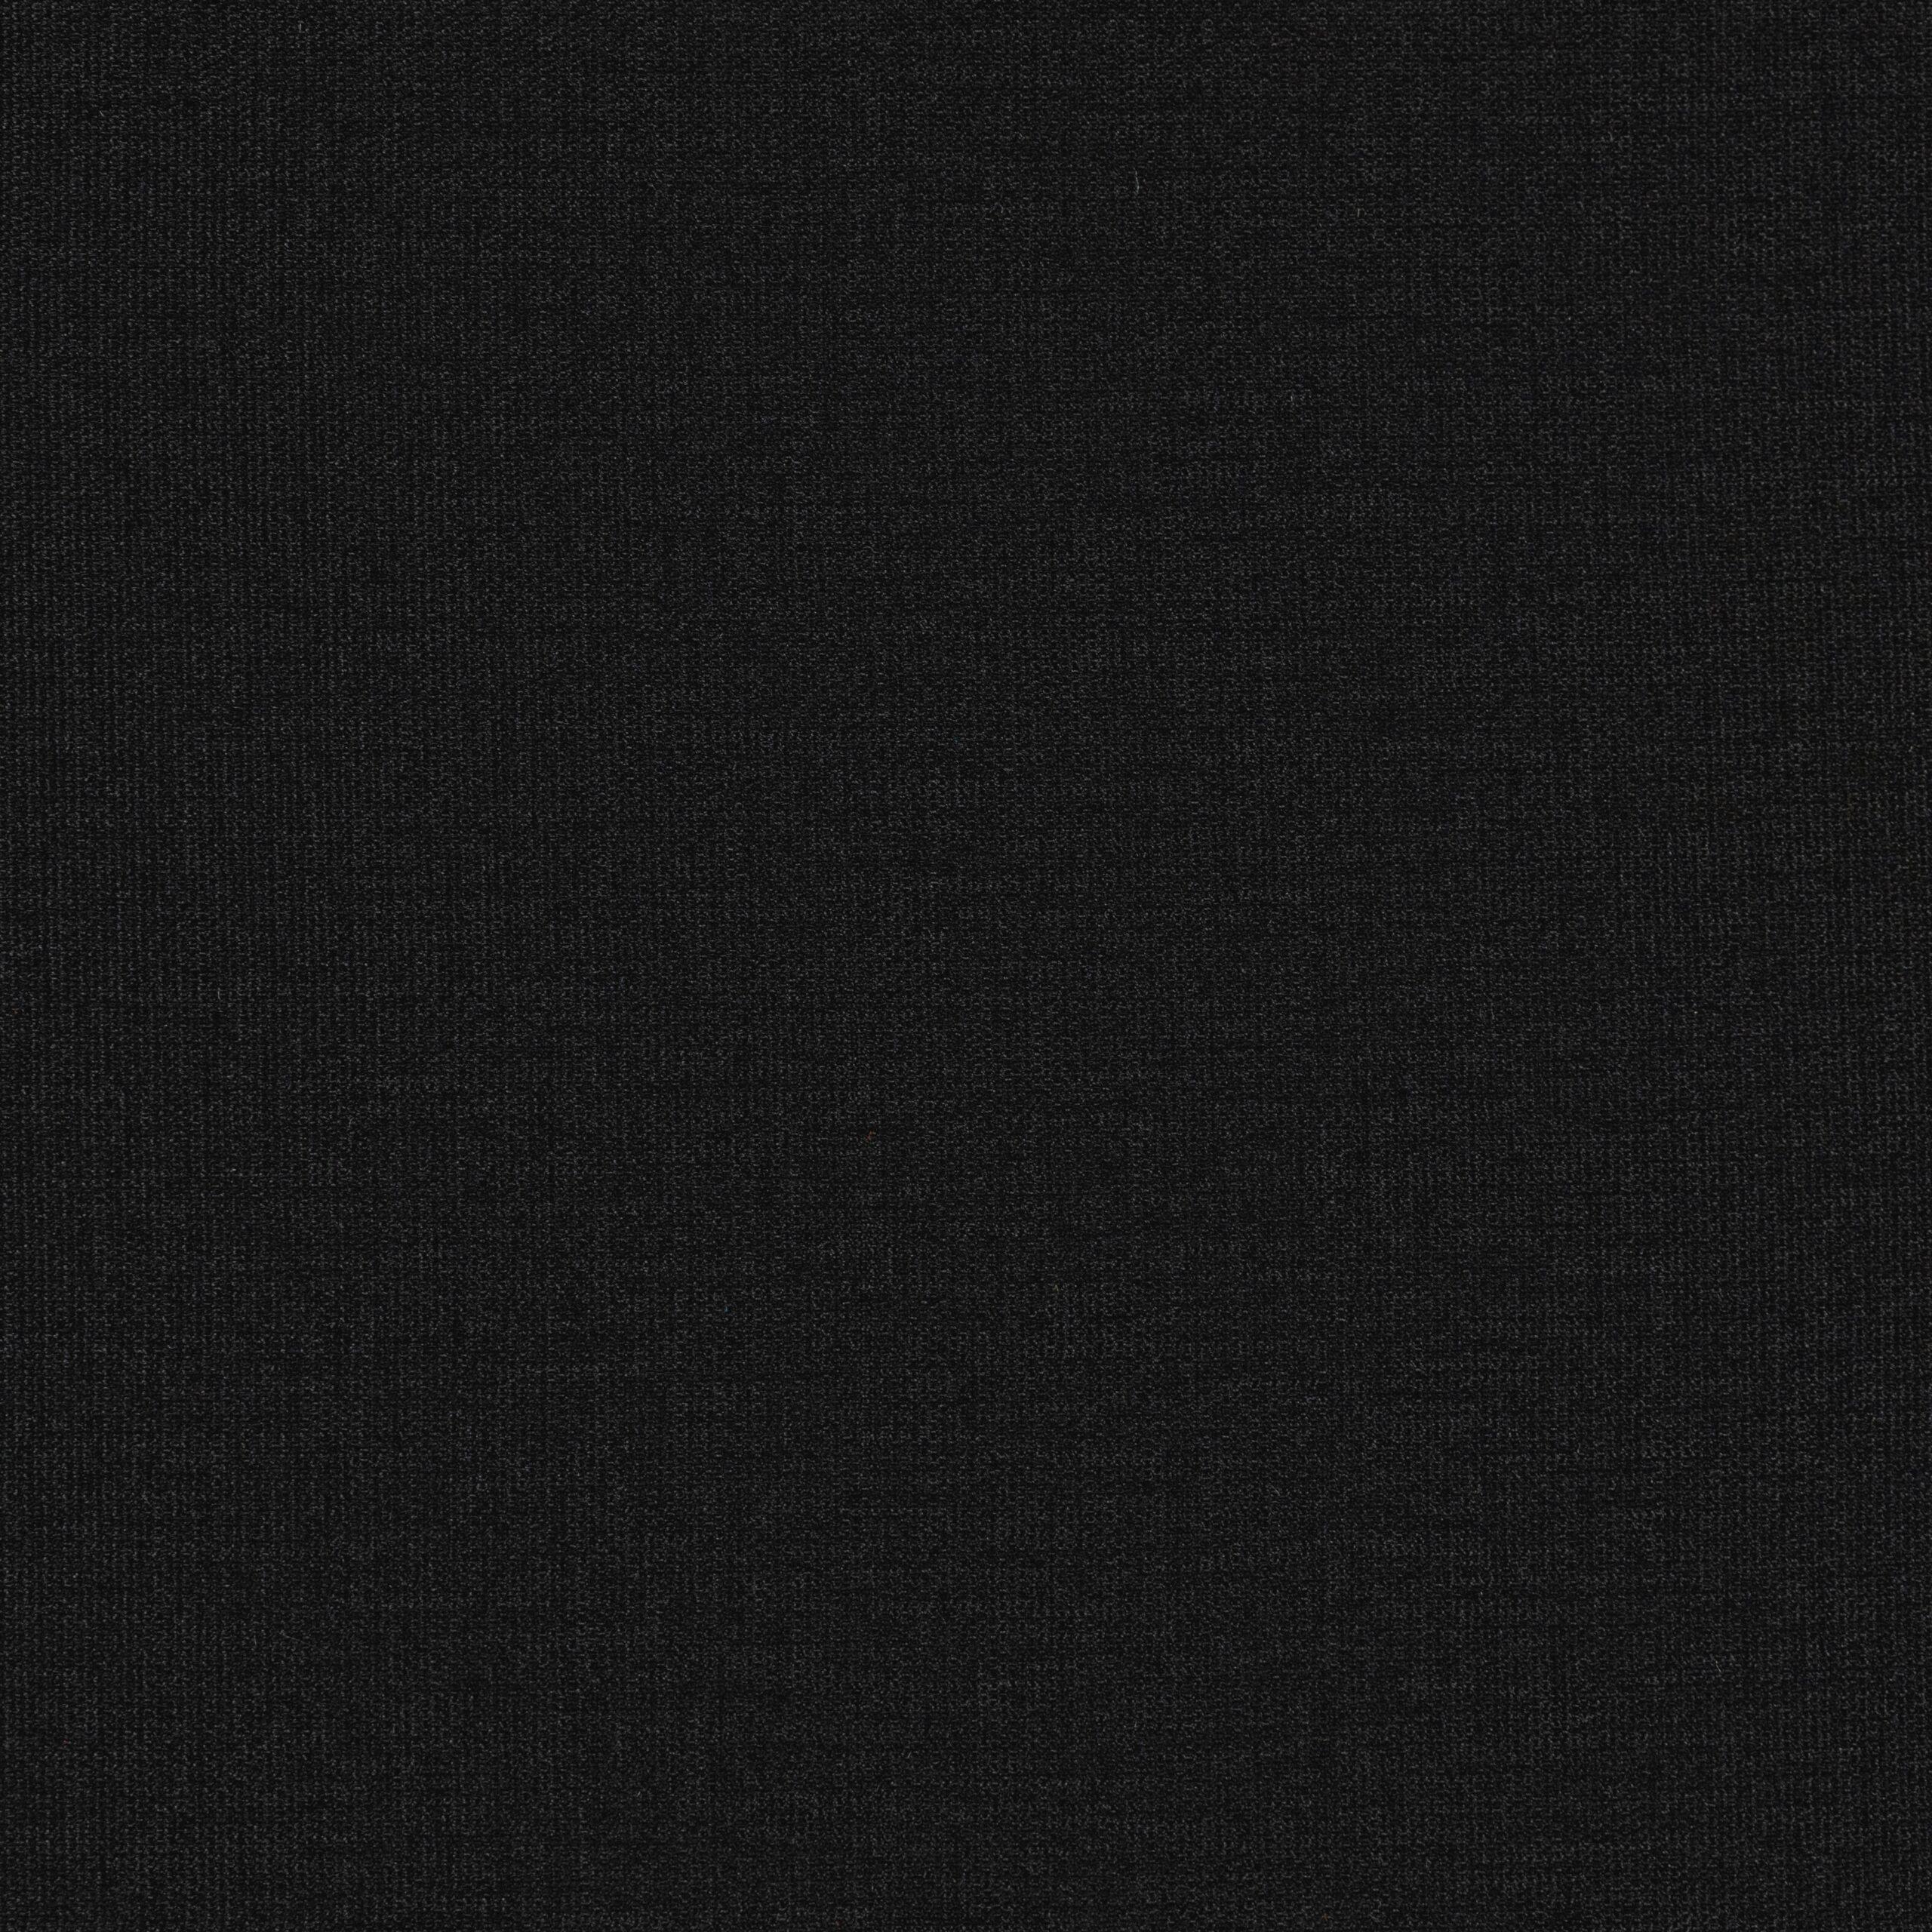 Lido Trend 4 Black